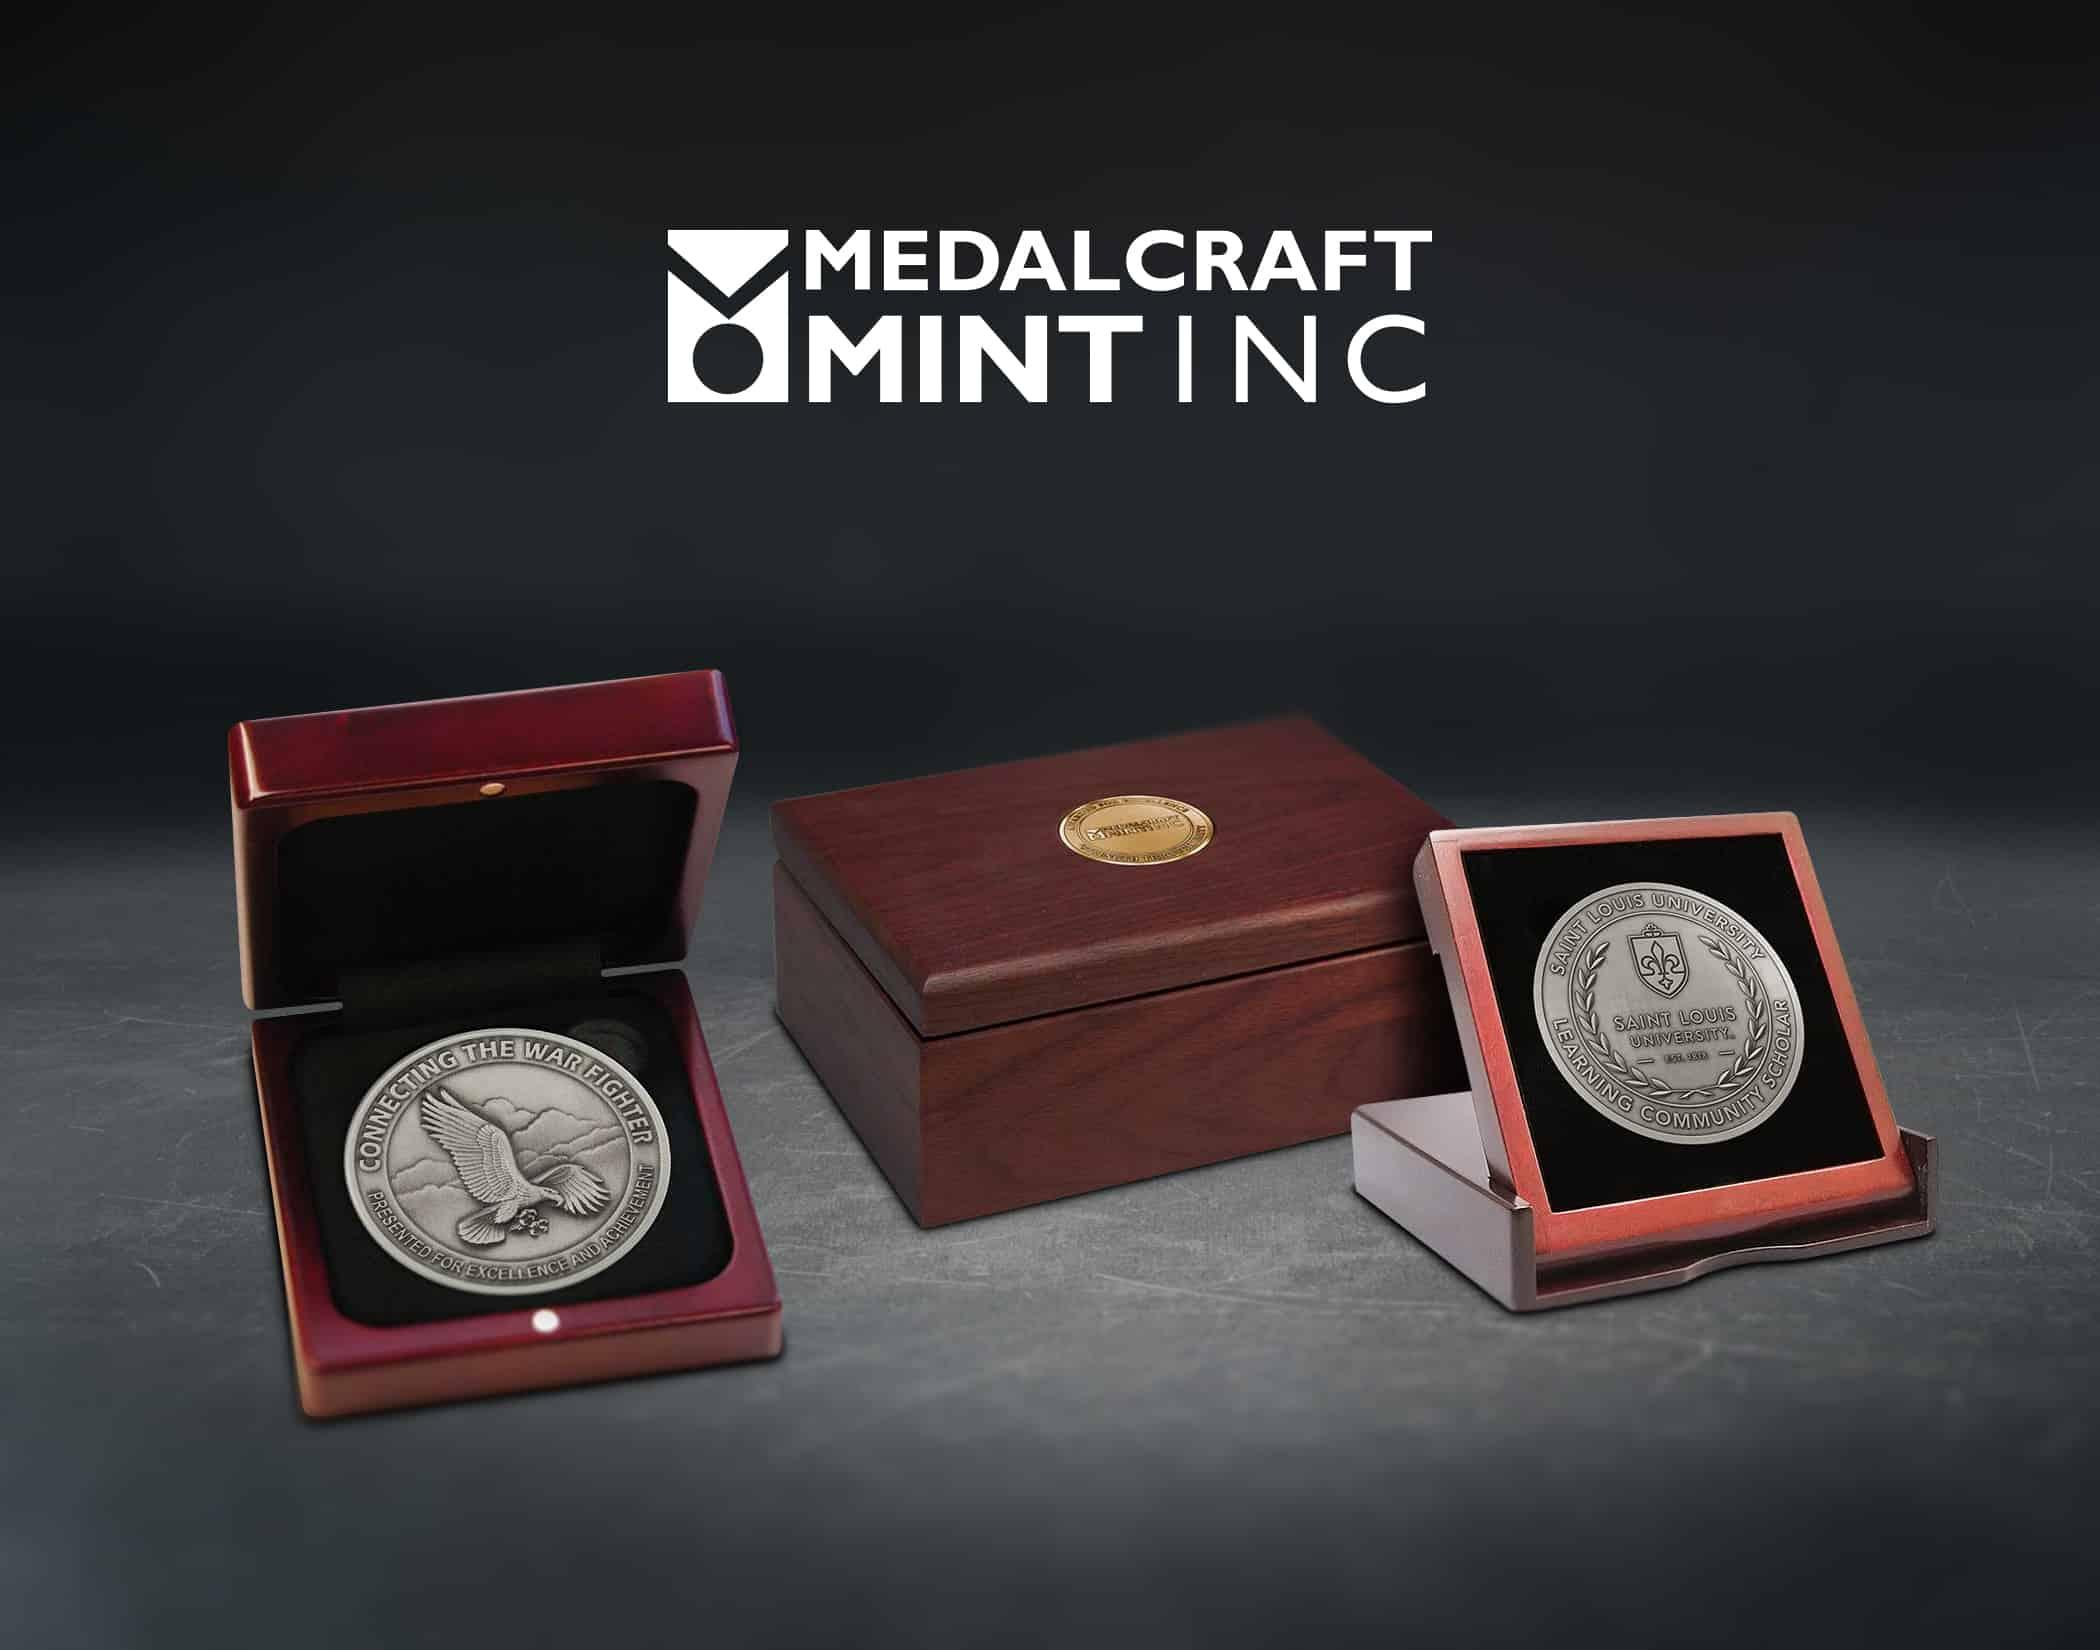 Medalcraft Mint wooden box medals